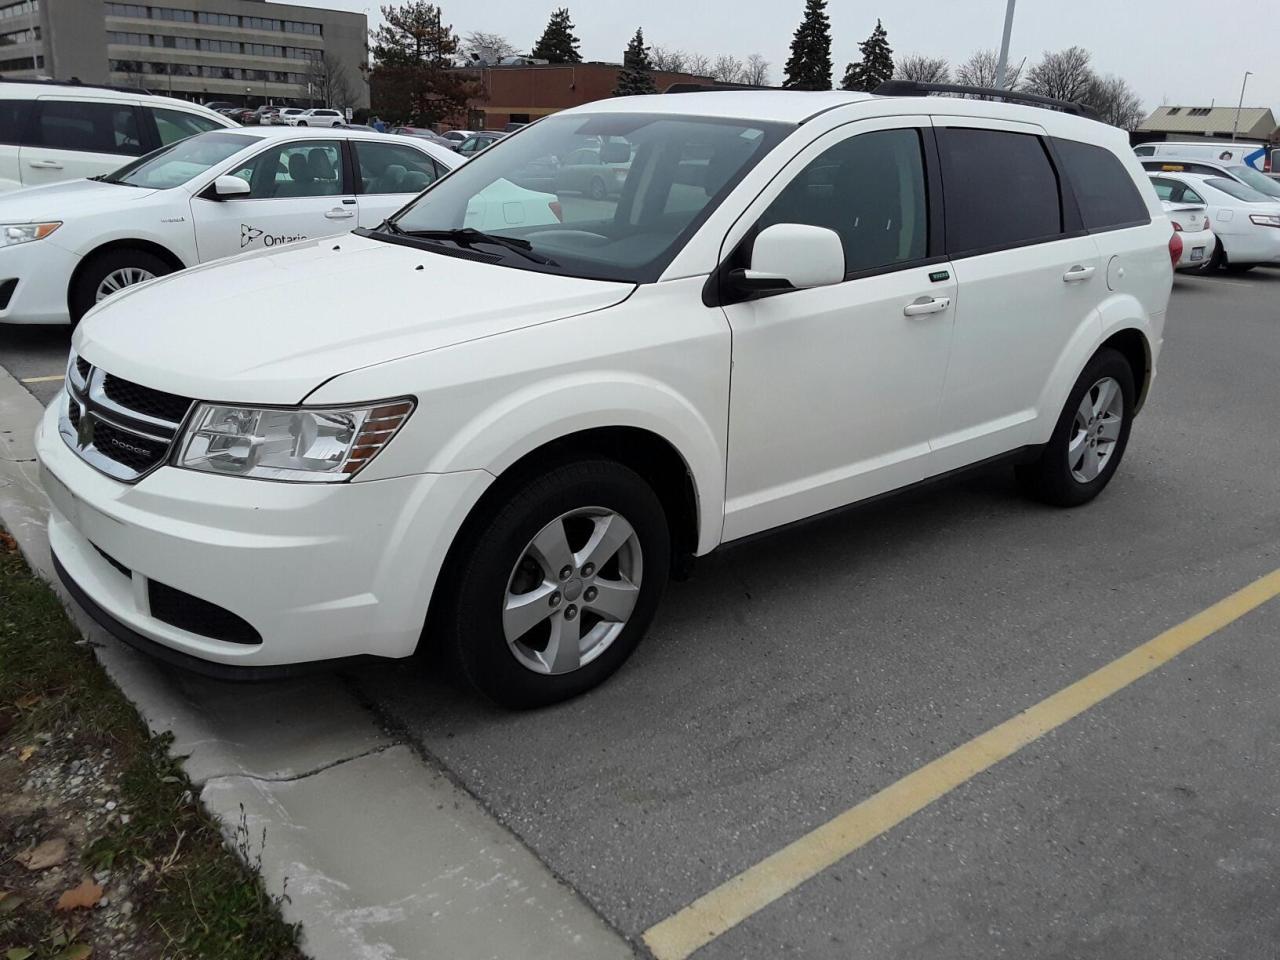 Photo of White 2011 Dodge Journey